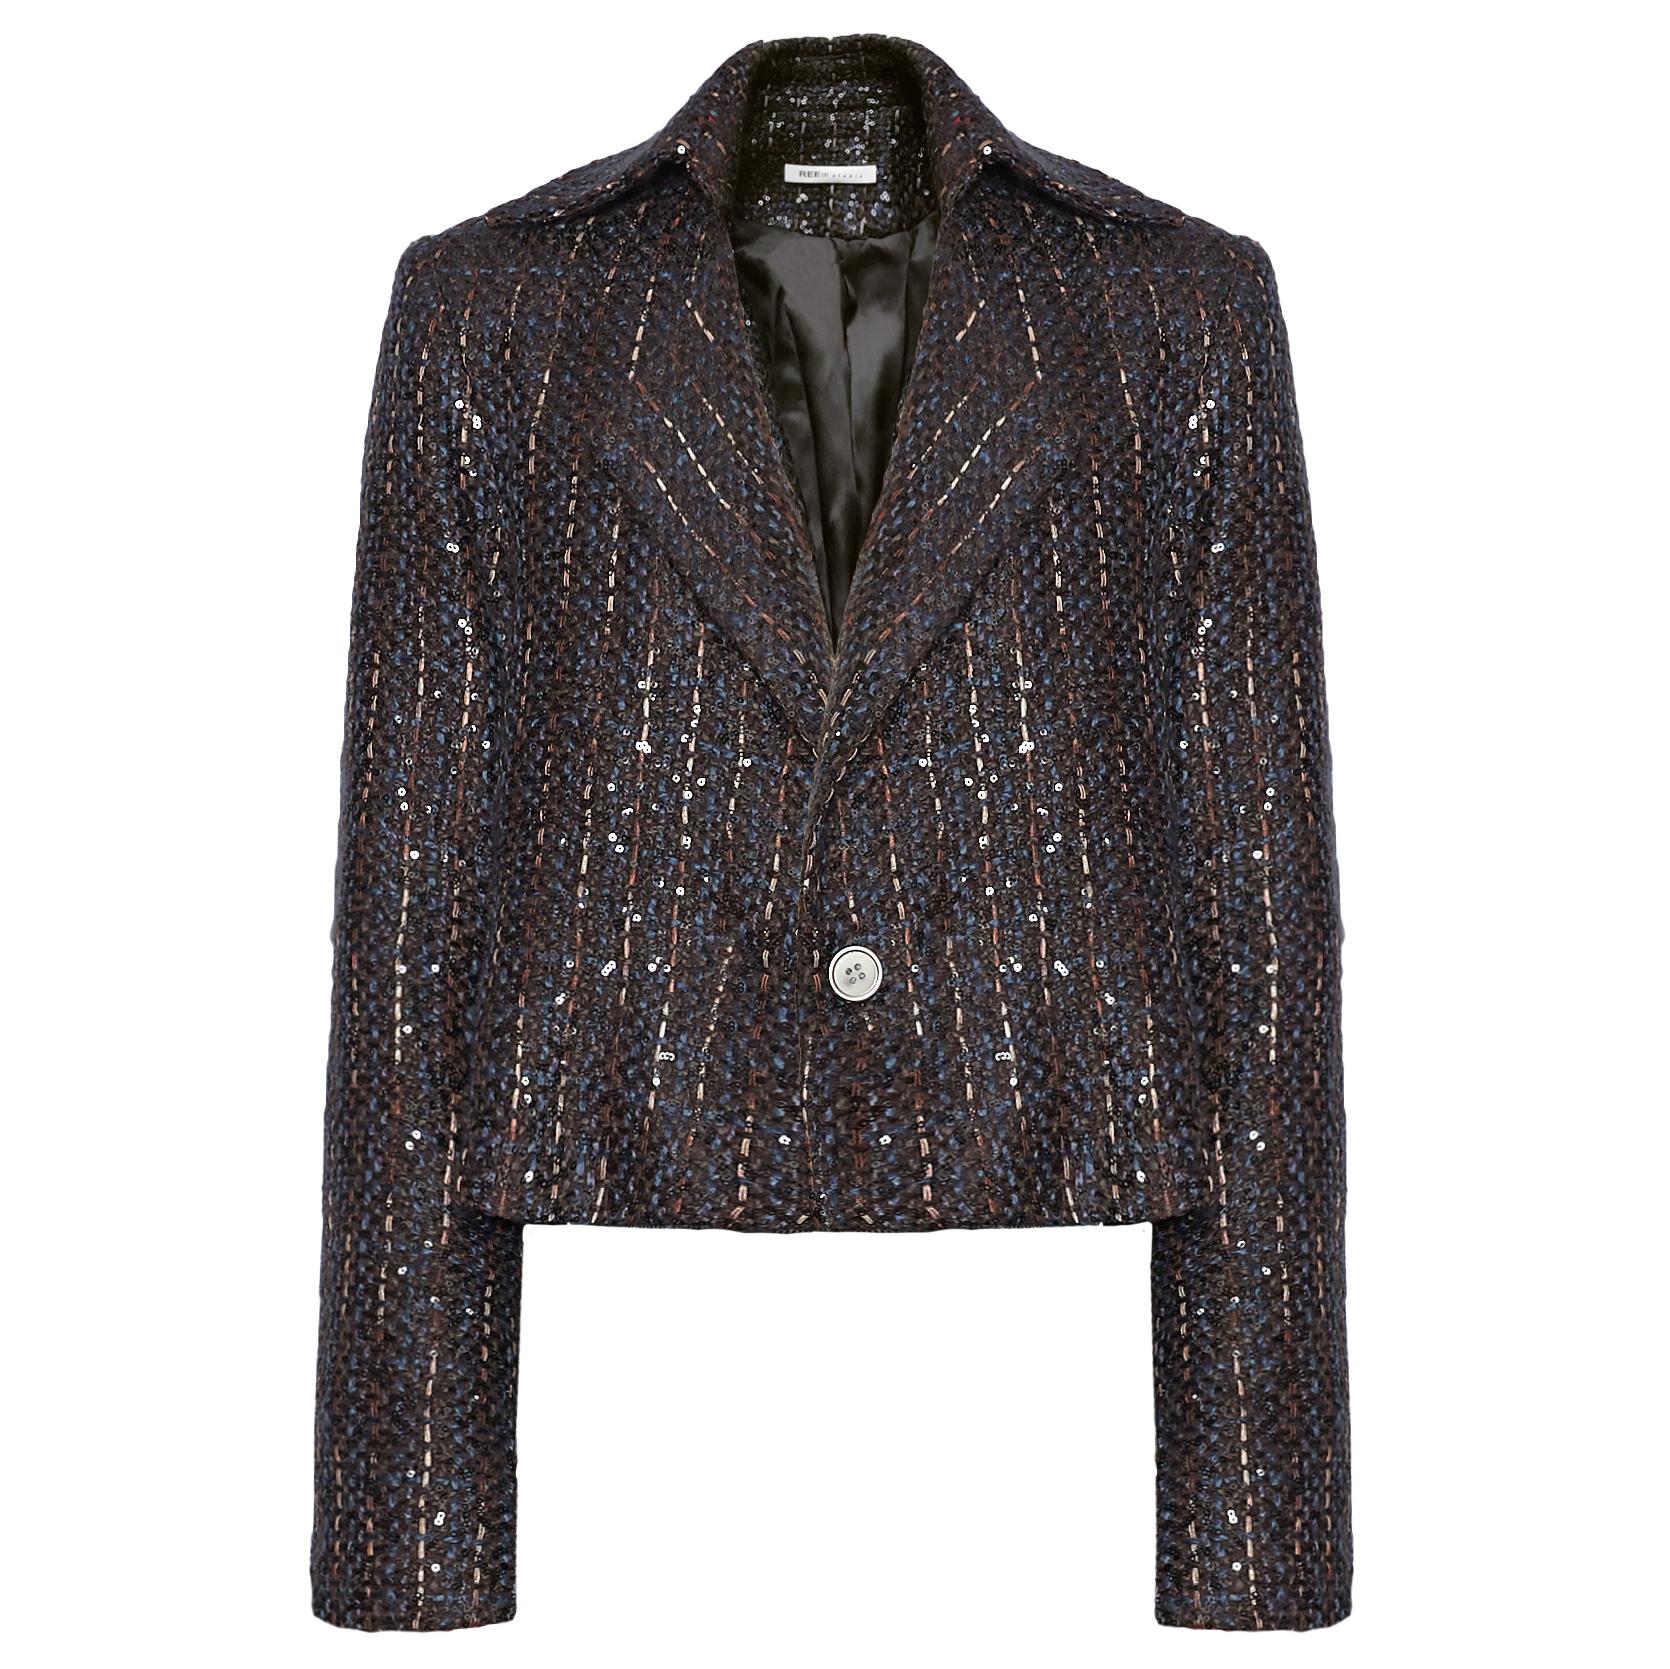 REEth鎏金三色线西服时髦个性黑色礼服外套短款…